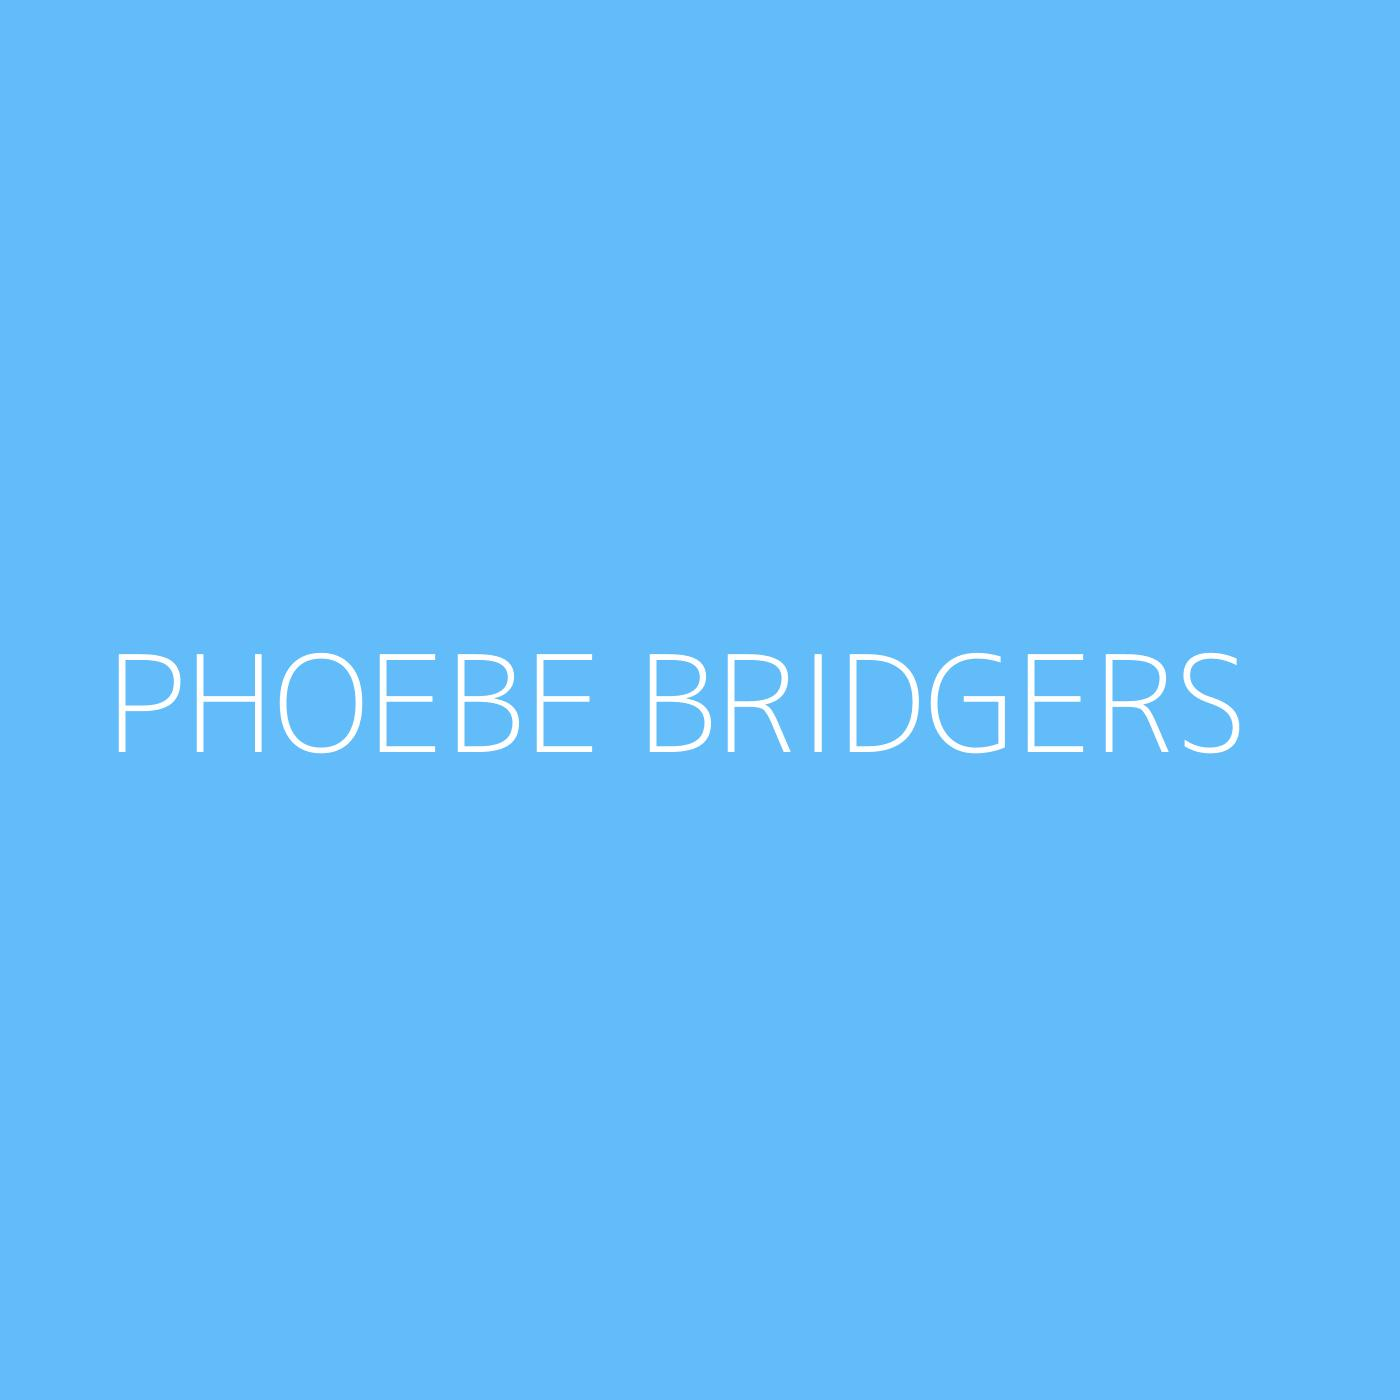 Phoebe Bridgers Playlist Artwork